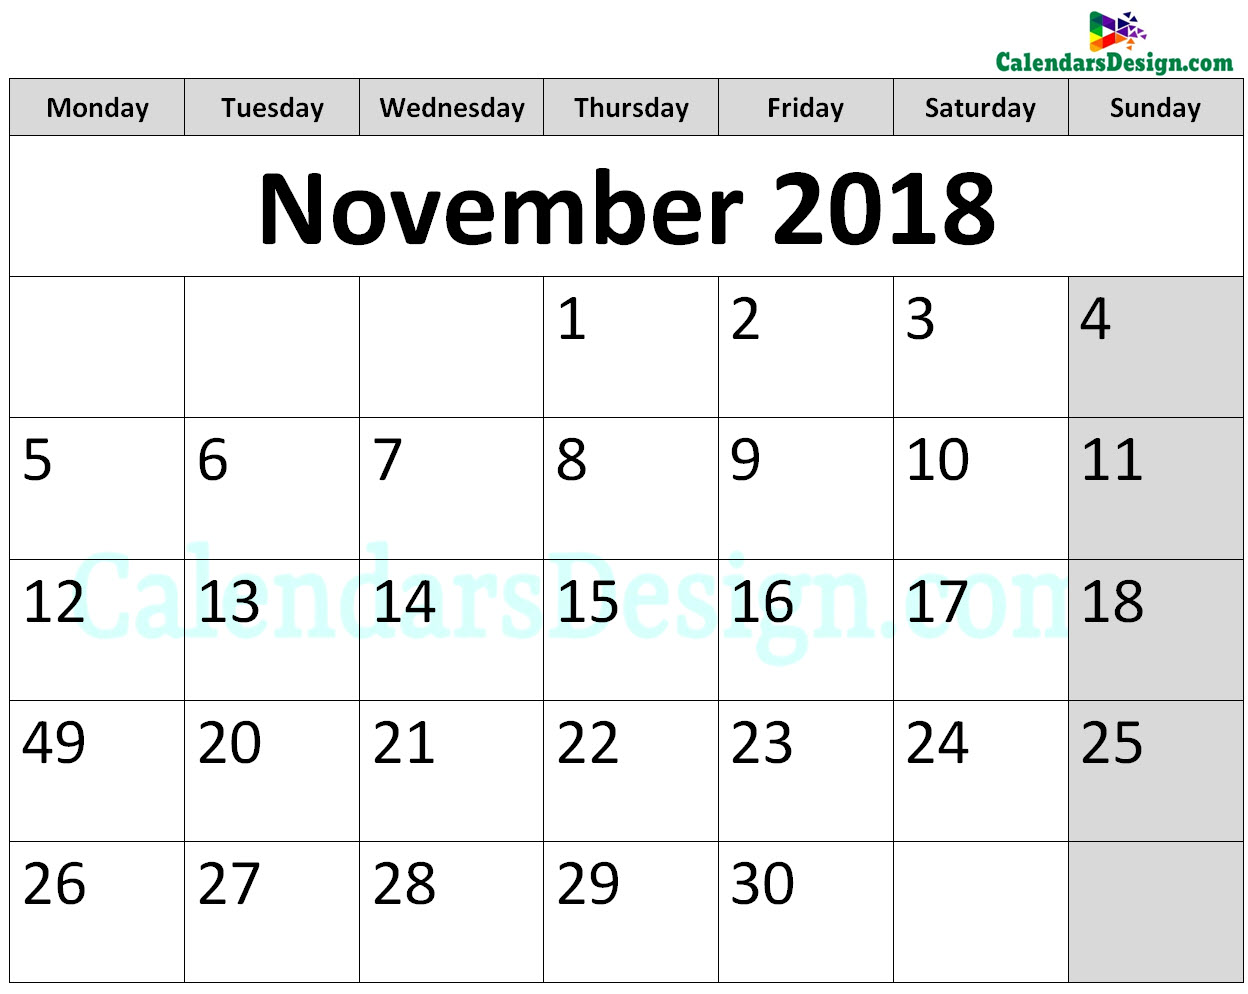 Printable Calendar for November 2018 Page